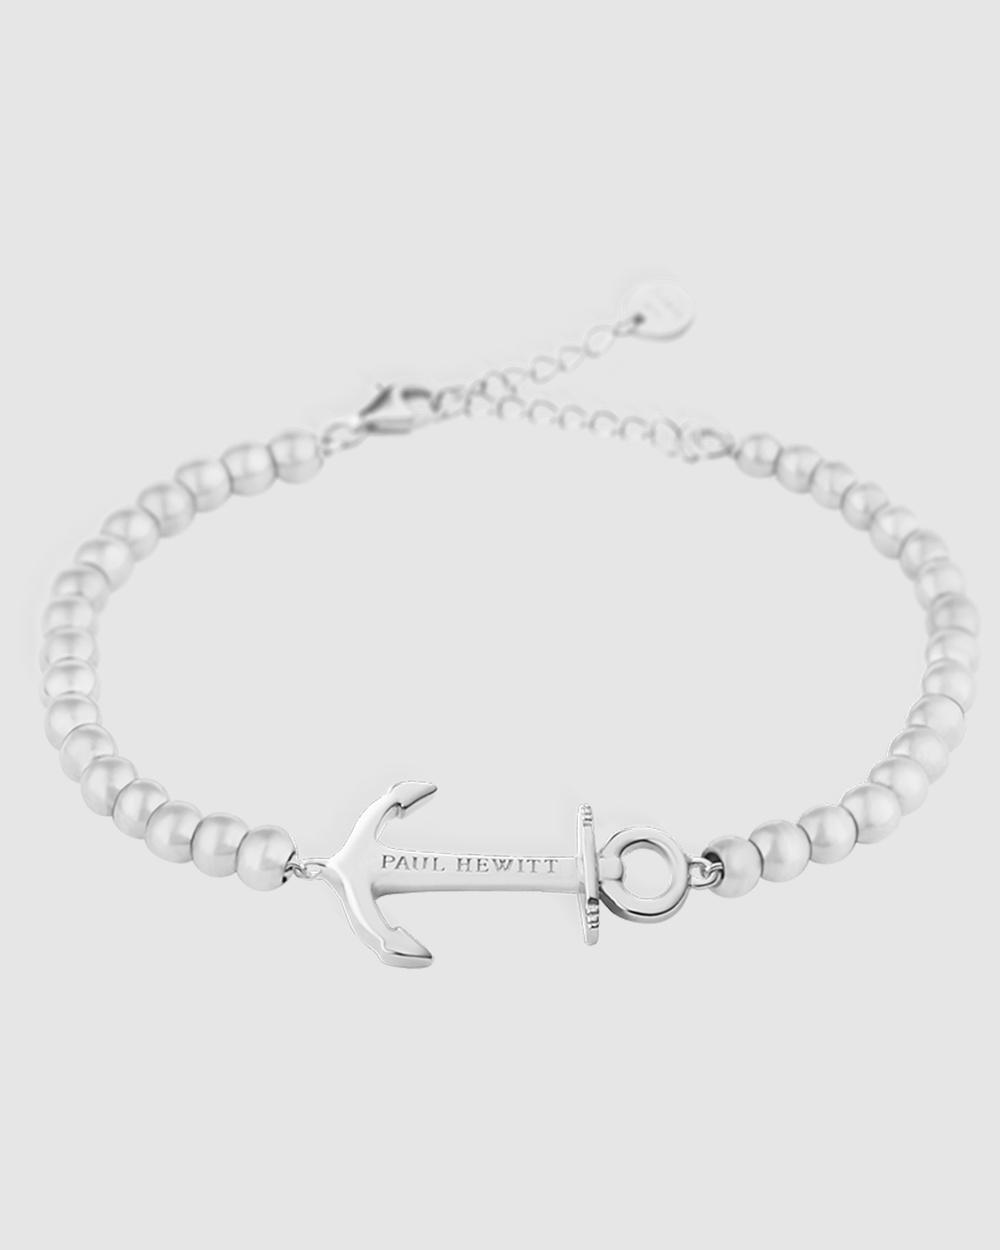 Paul Hewitt Anchor Spirit Stainless Steel Bracelet Jewellery Silver